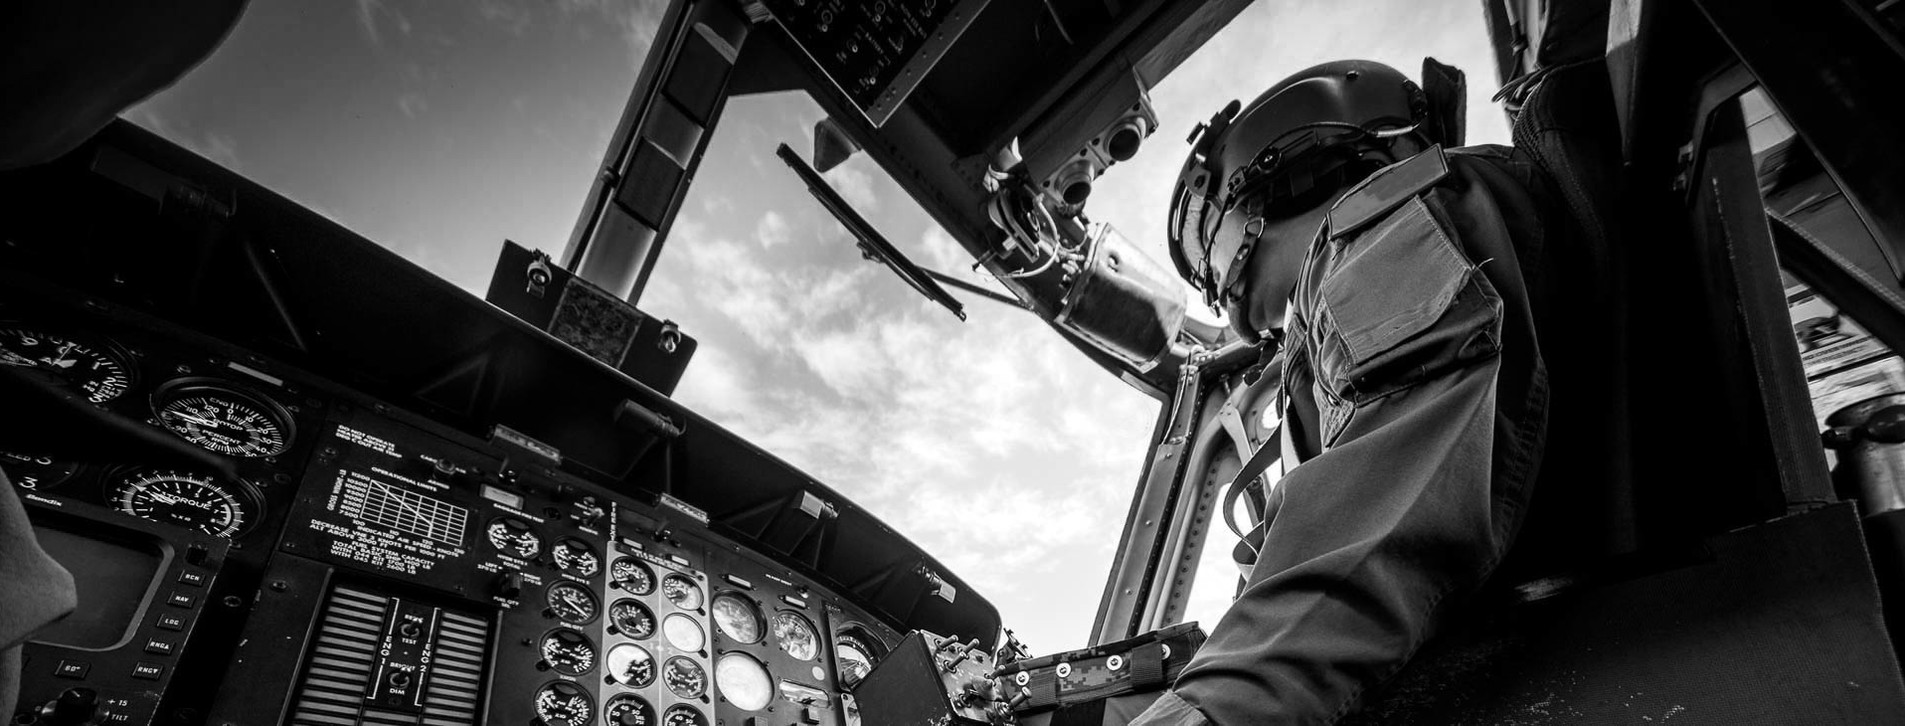 Фото 1 - Авиасимулятор вертолета Ми-8